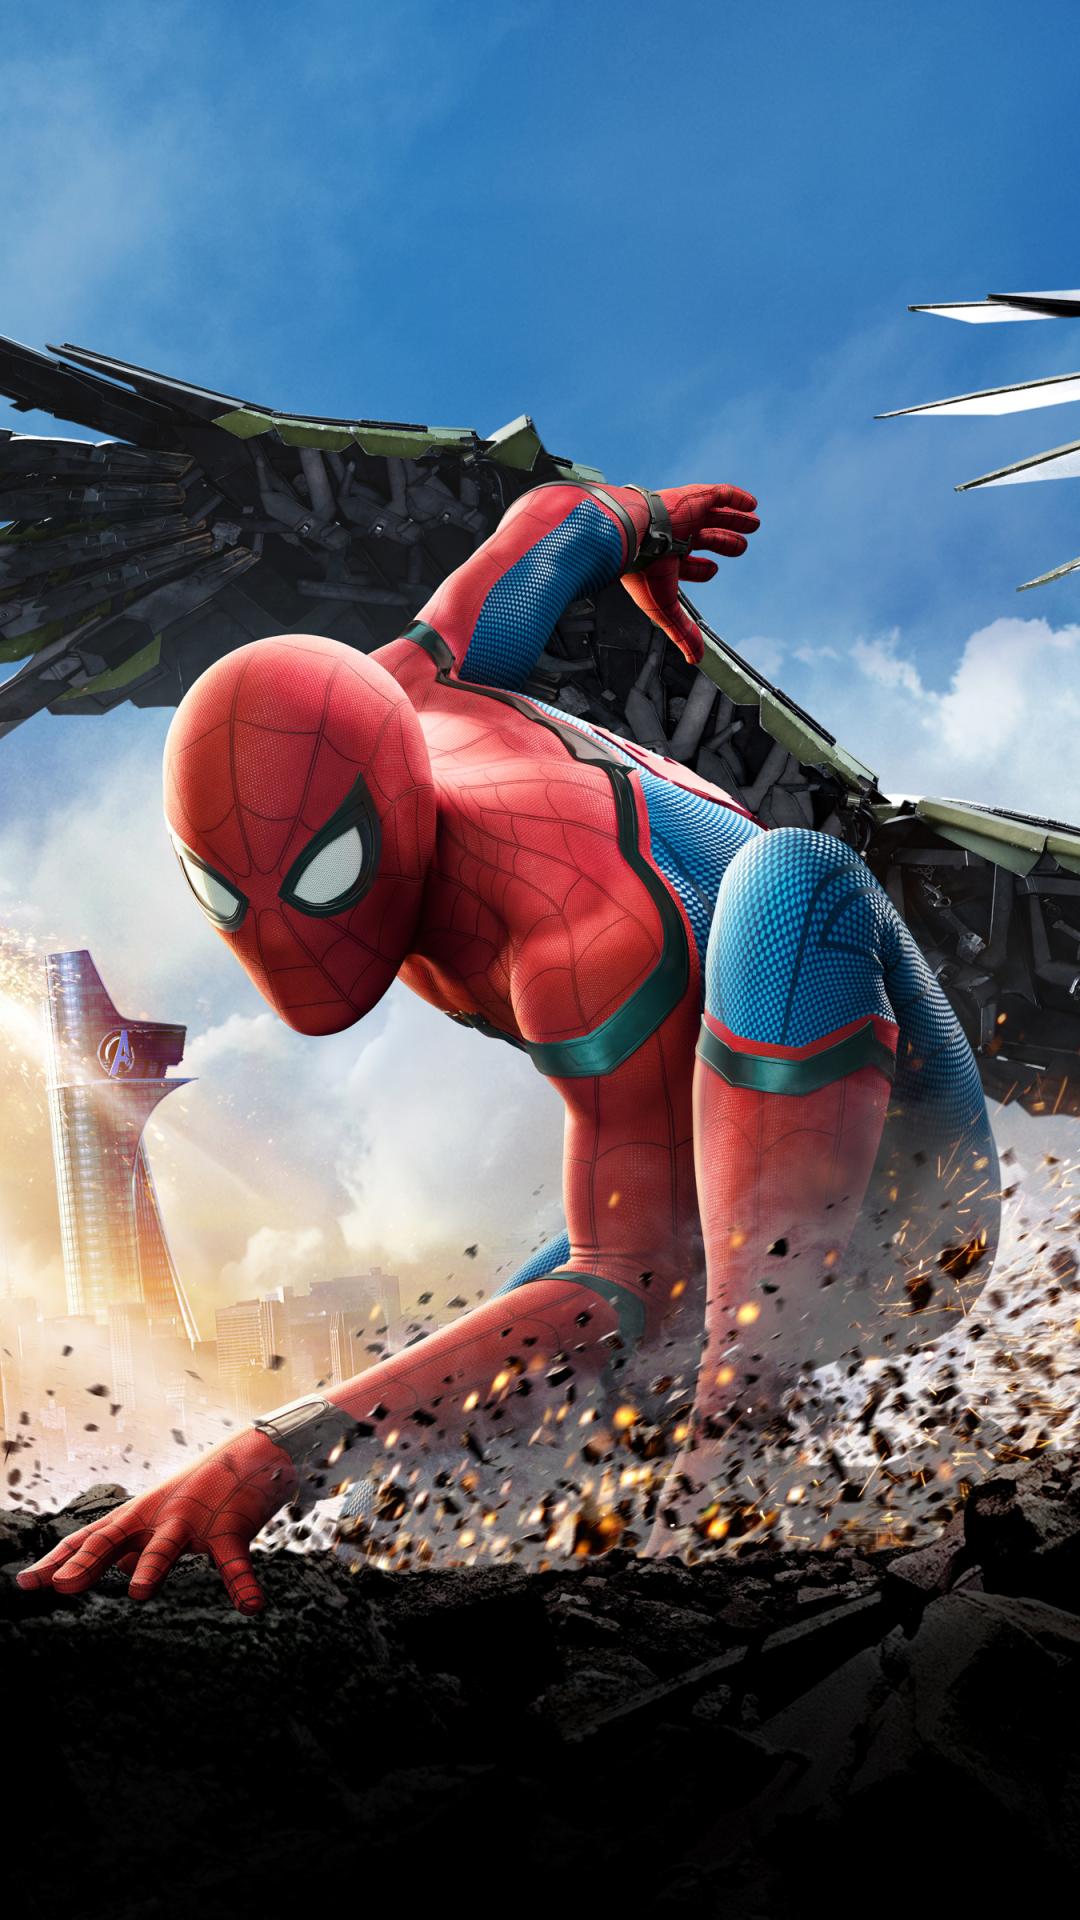 MovieSpider Man Homecoming 1080x1920 Wallpaper ID 683000 1080x1920